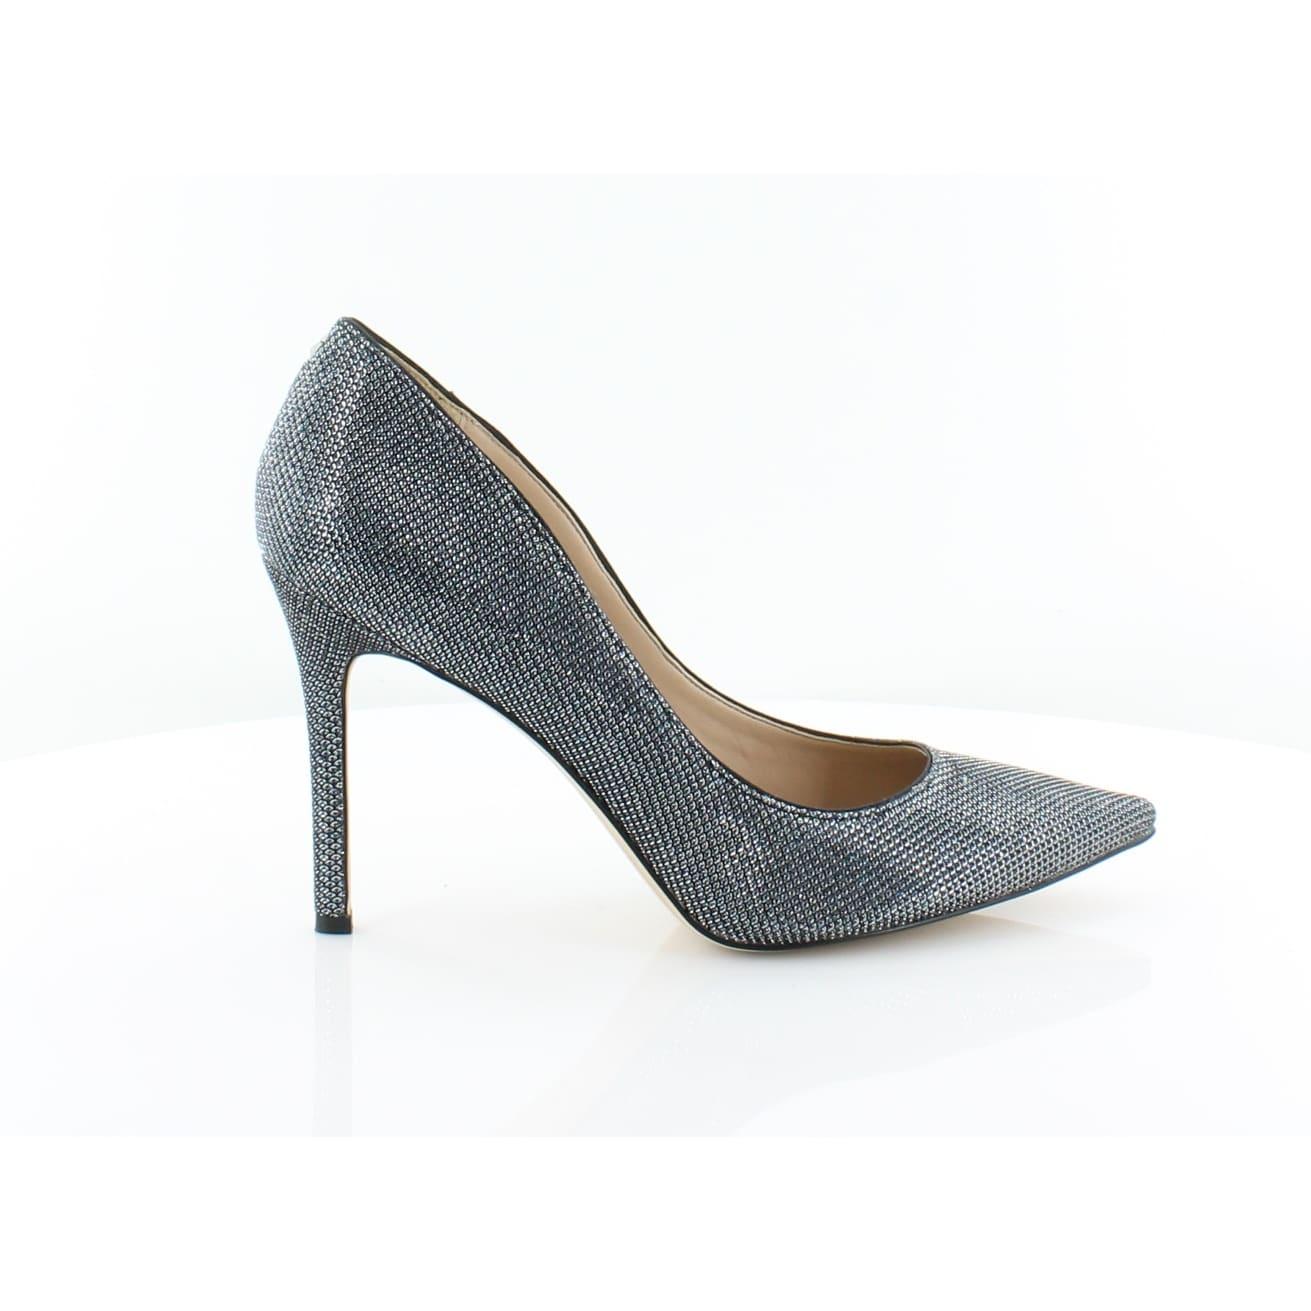 27198c64951c Shop Sam Edelman Hazel Women s Heels Blue Metal Mesh - 7 - Free Shipping  Today - Overstock - 27084707